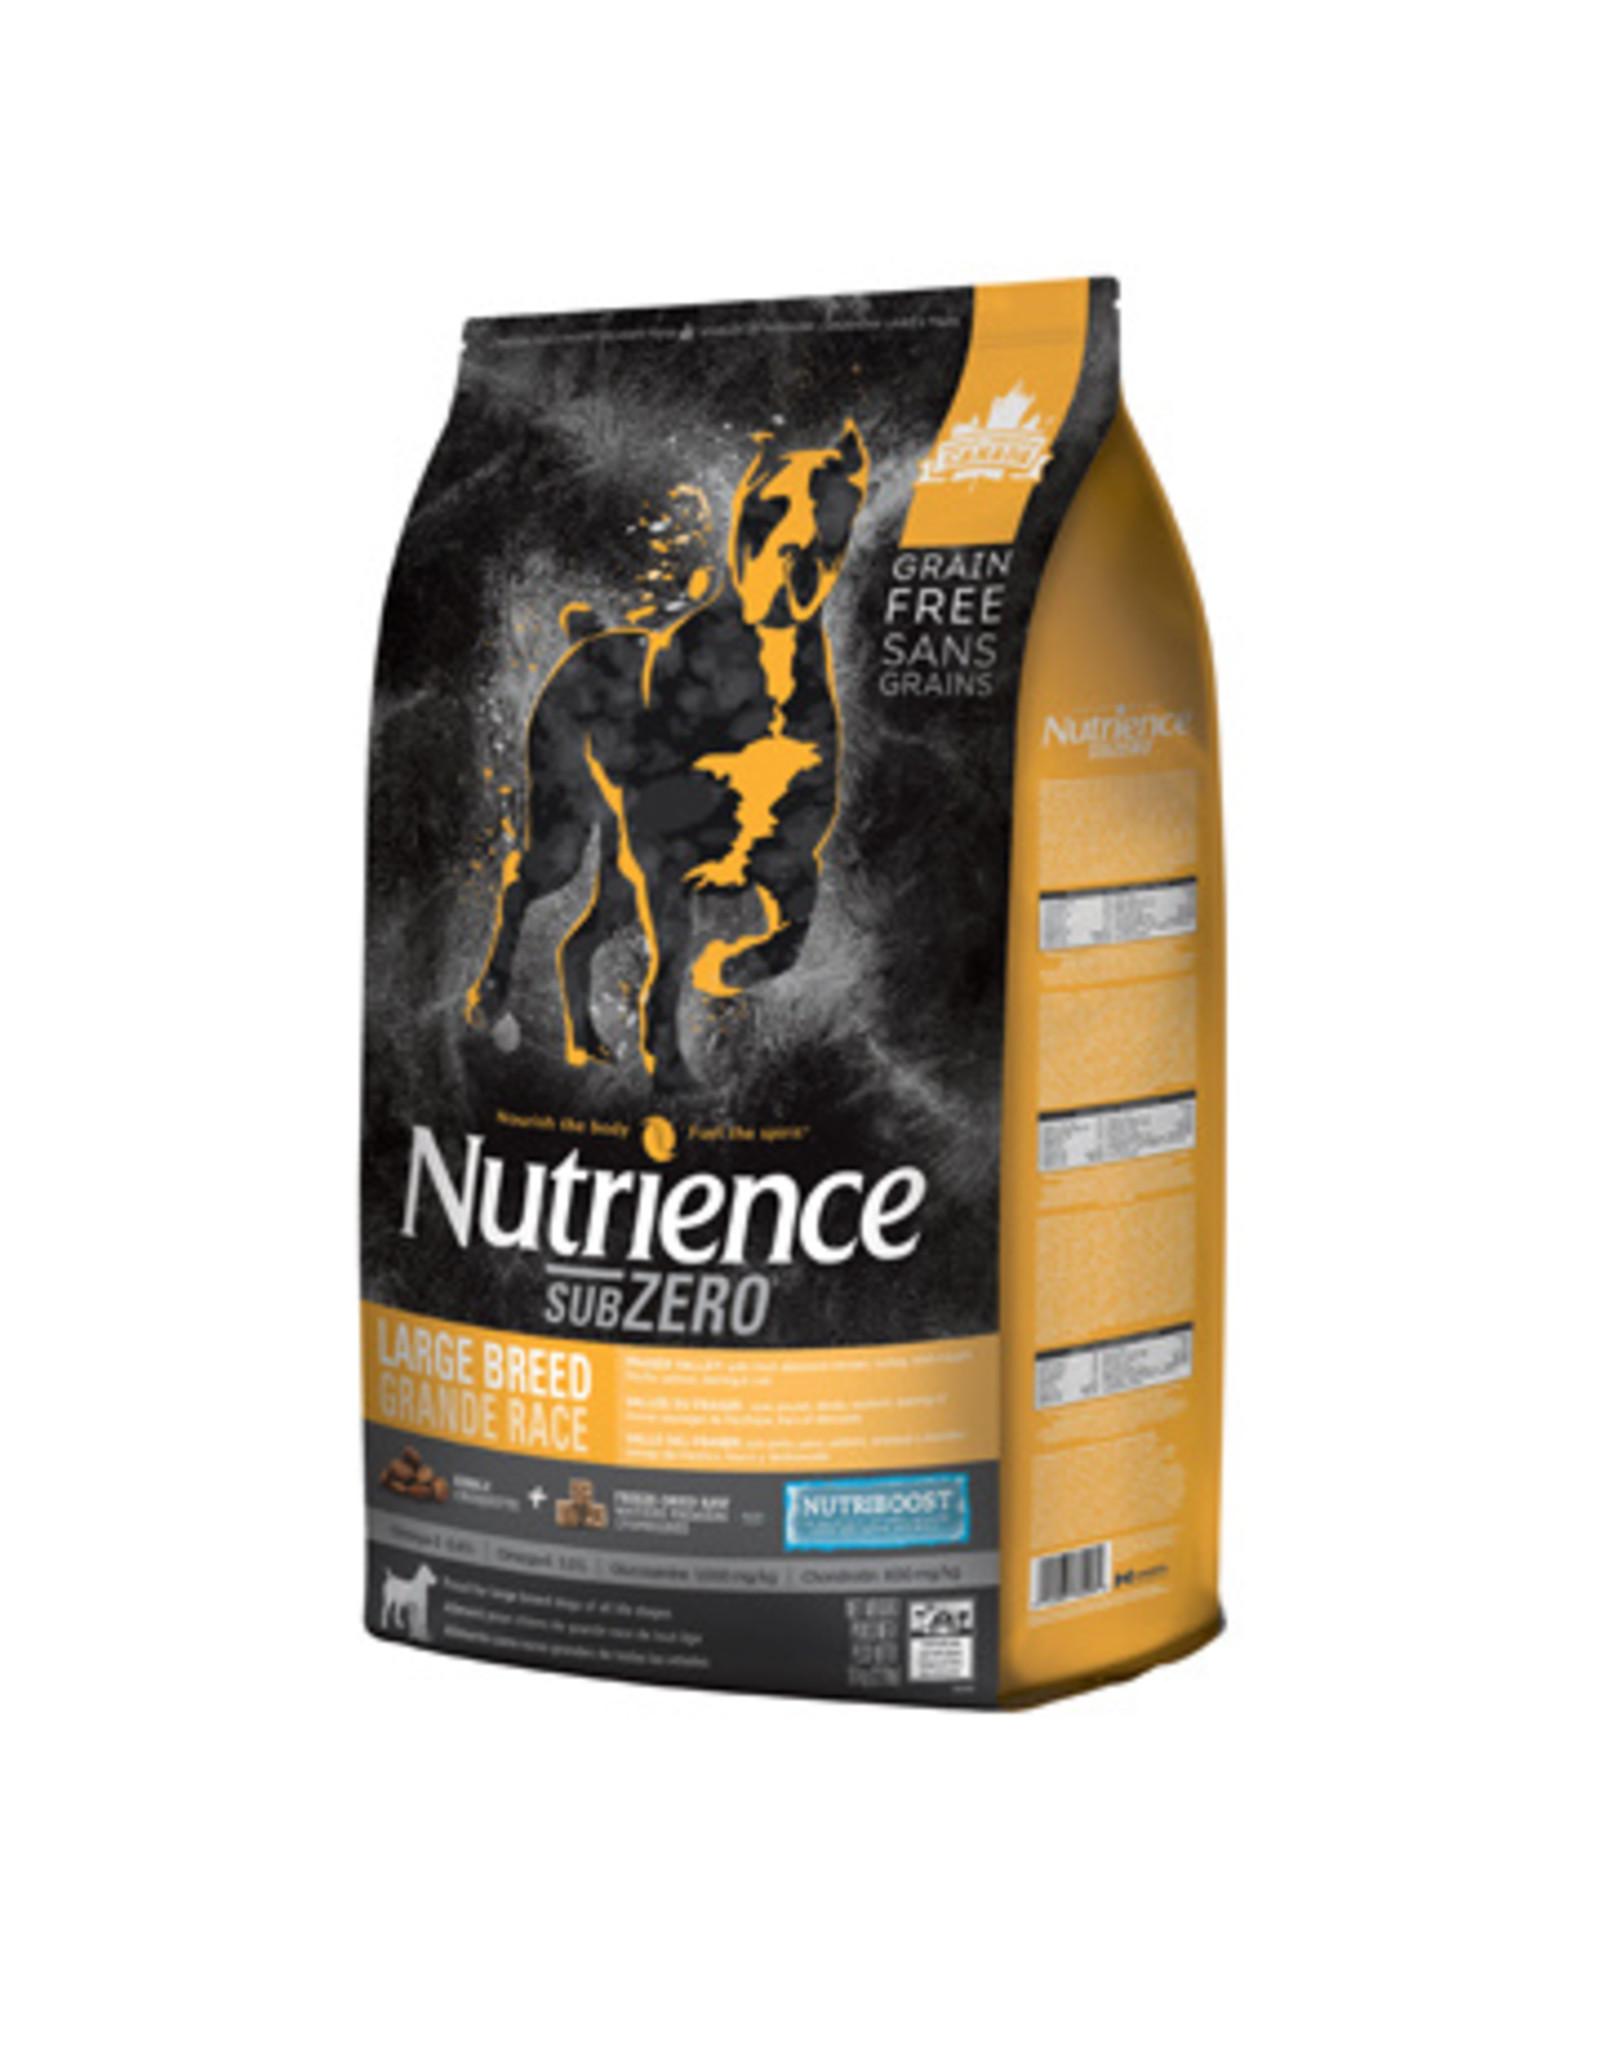 Nutrience Nutrience Grain Free Subzero Large Breed - 10kg